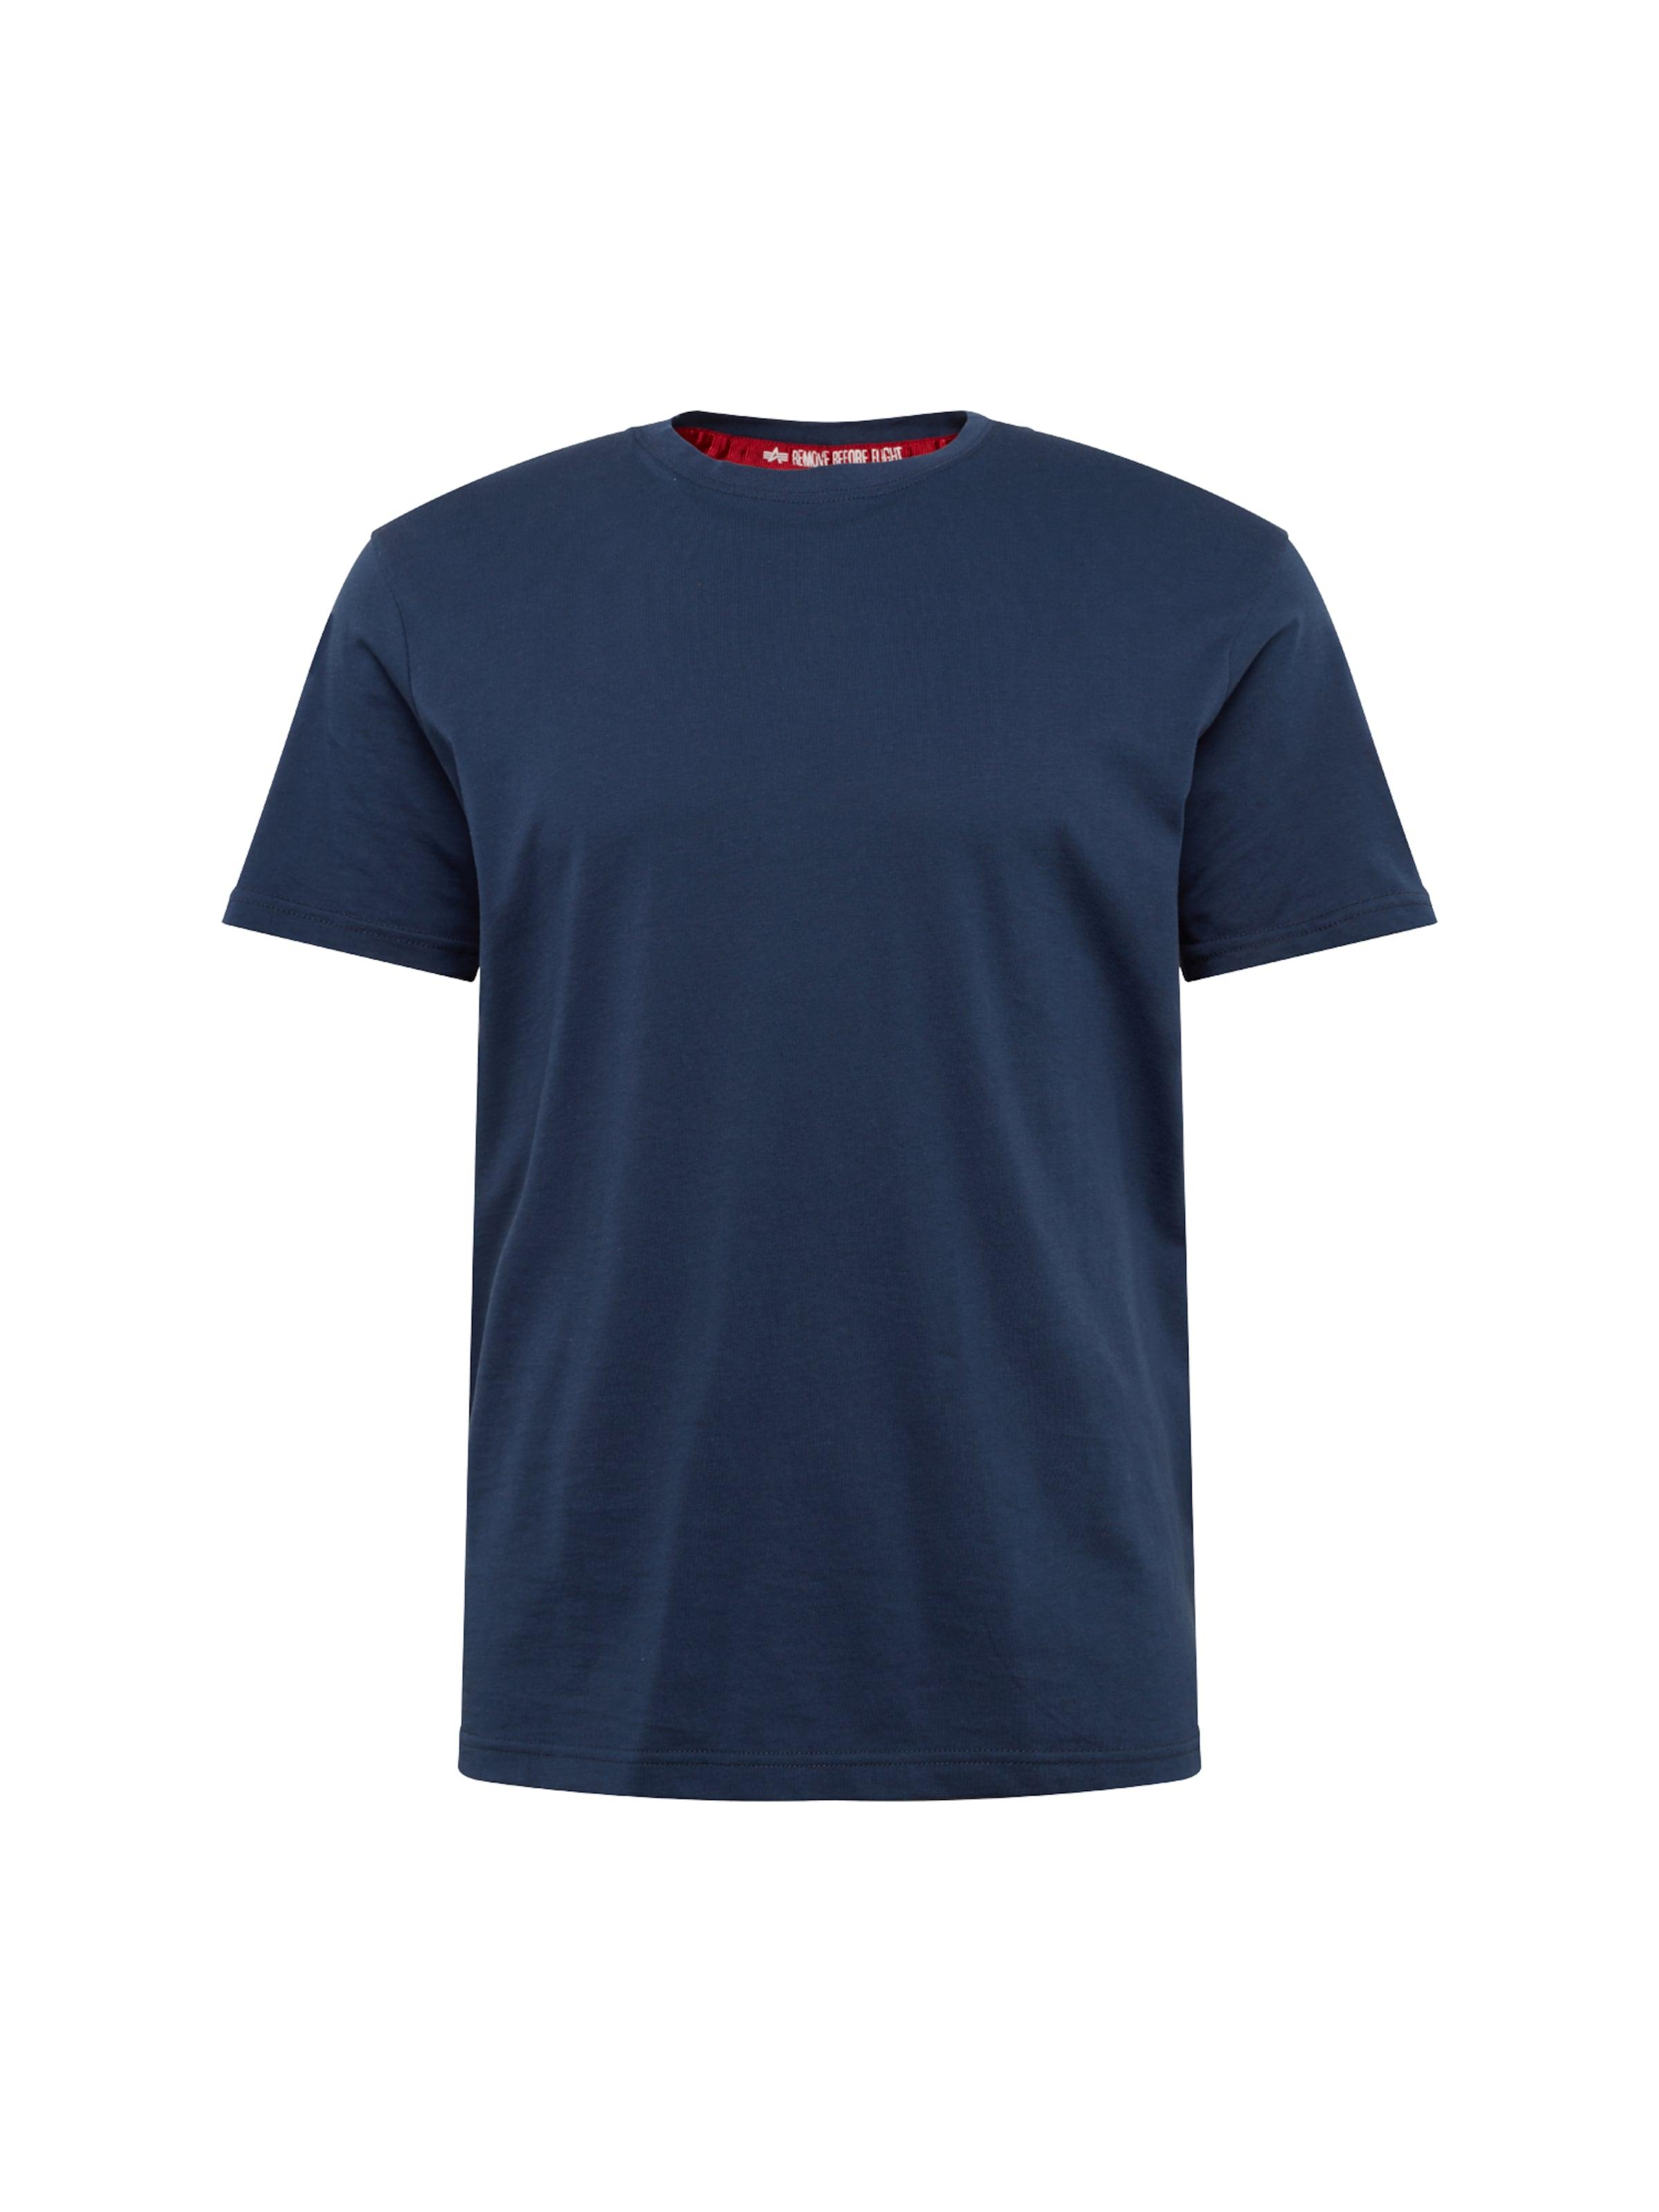 Alpha Shirt T' Navy Tape In Industries 'rbf roQCxEBeWd